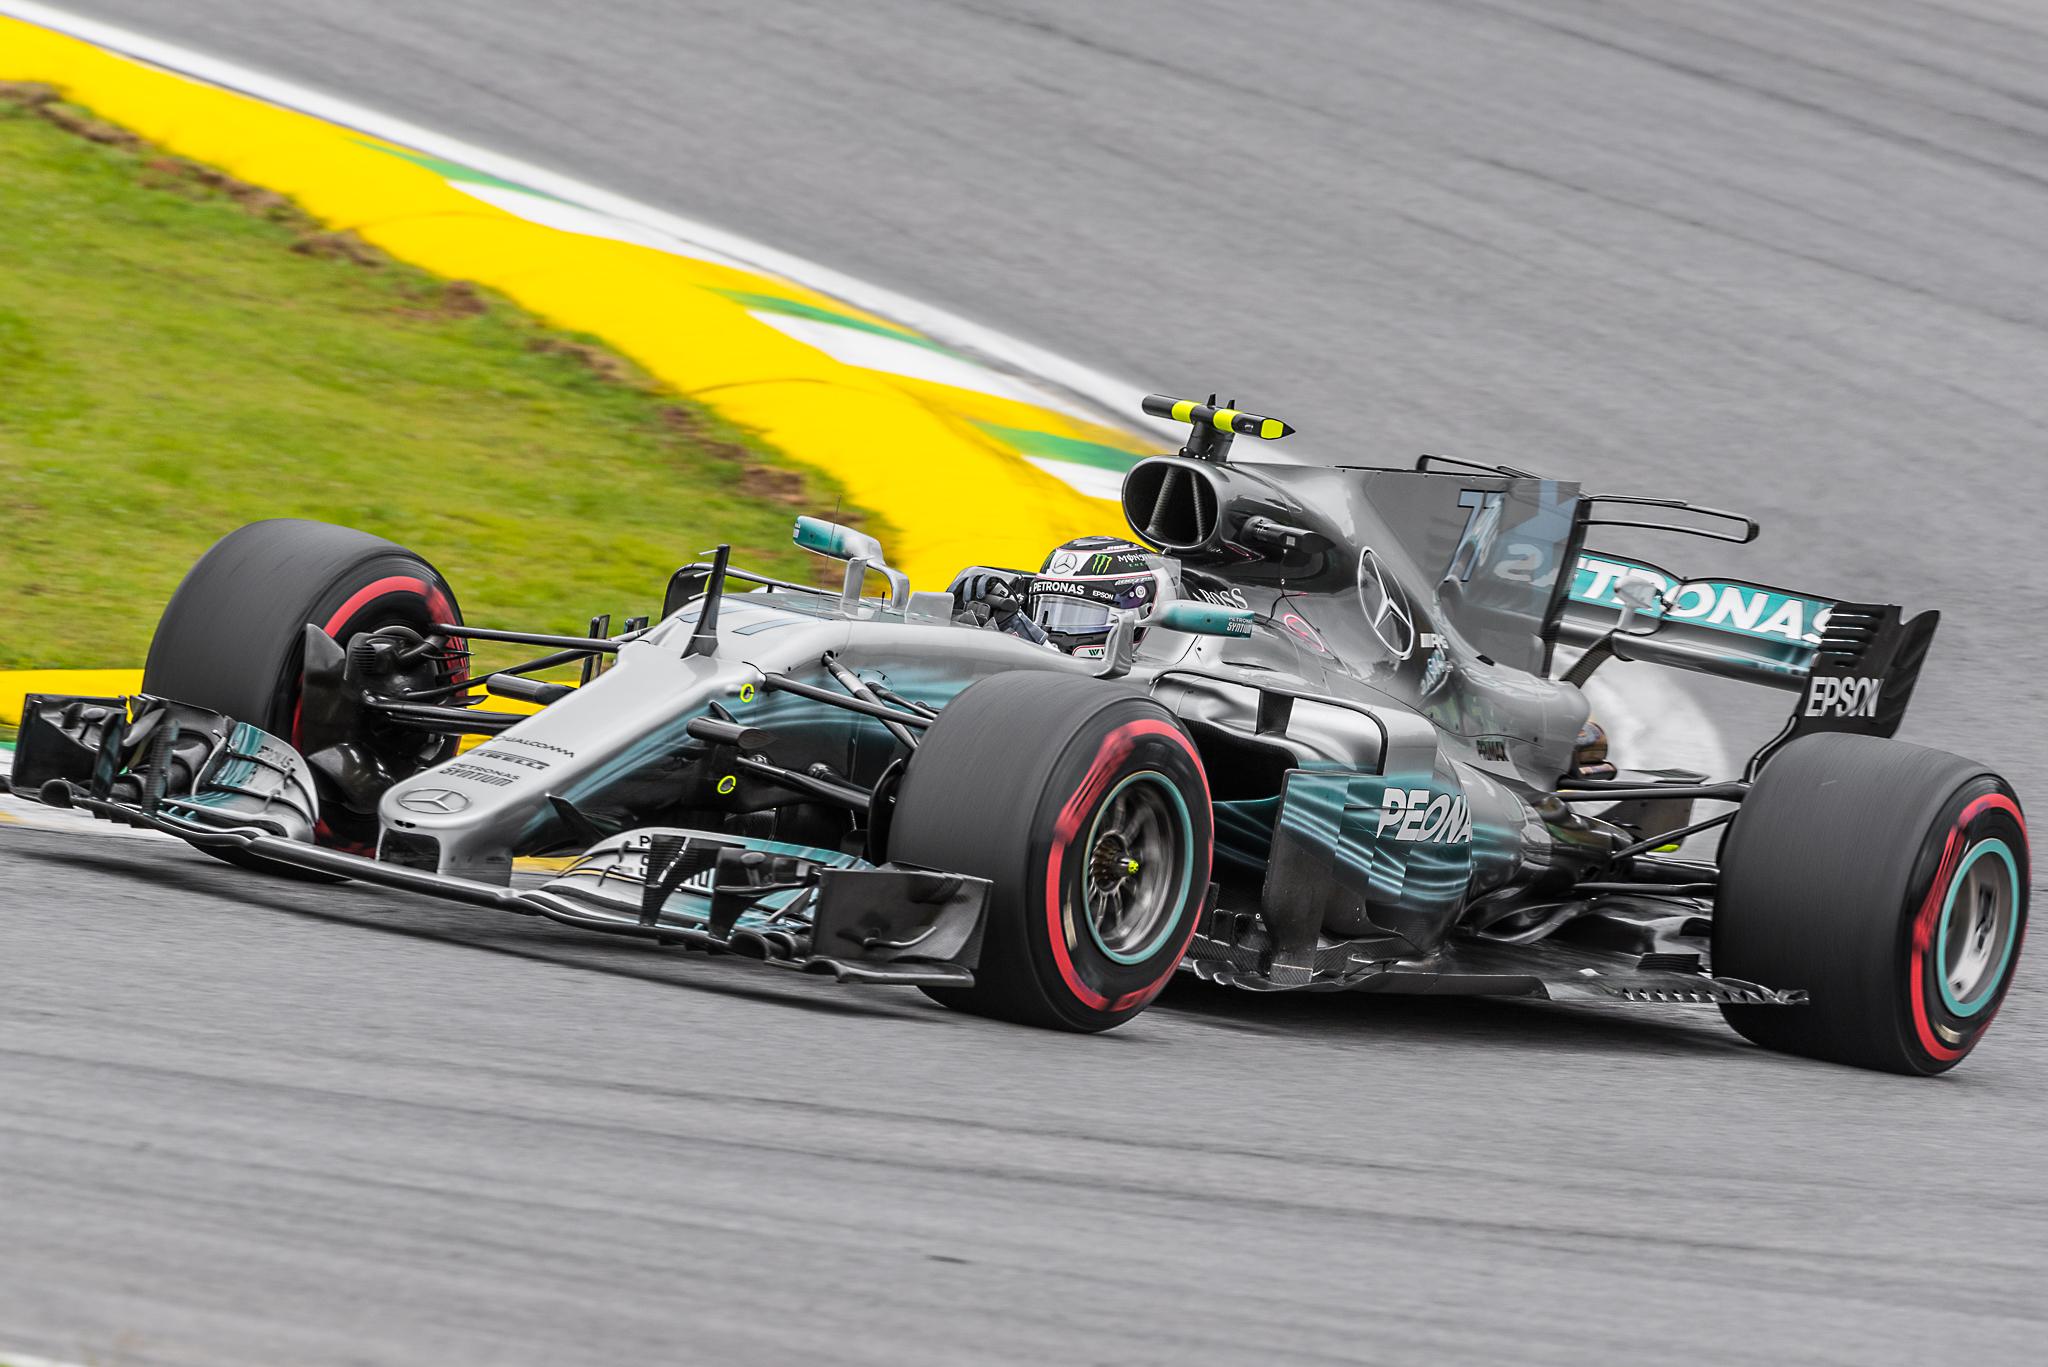 Piloto da Mercedes-AMG, Valtteri Bottas foi o pole position do GP Brasil de F-1 2017